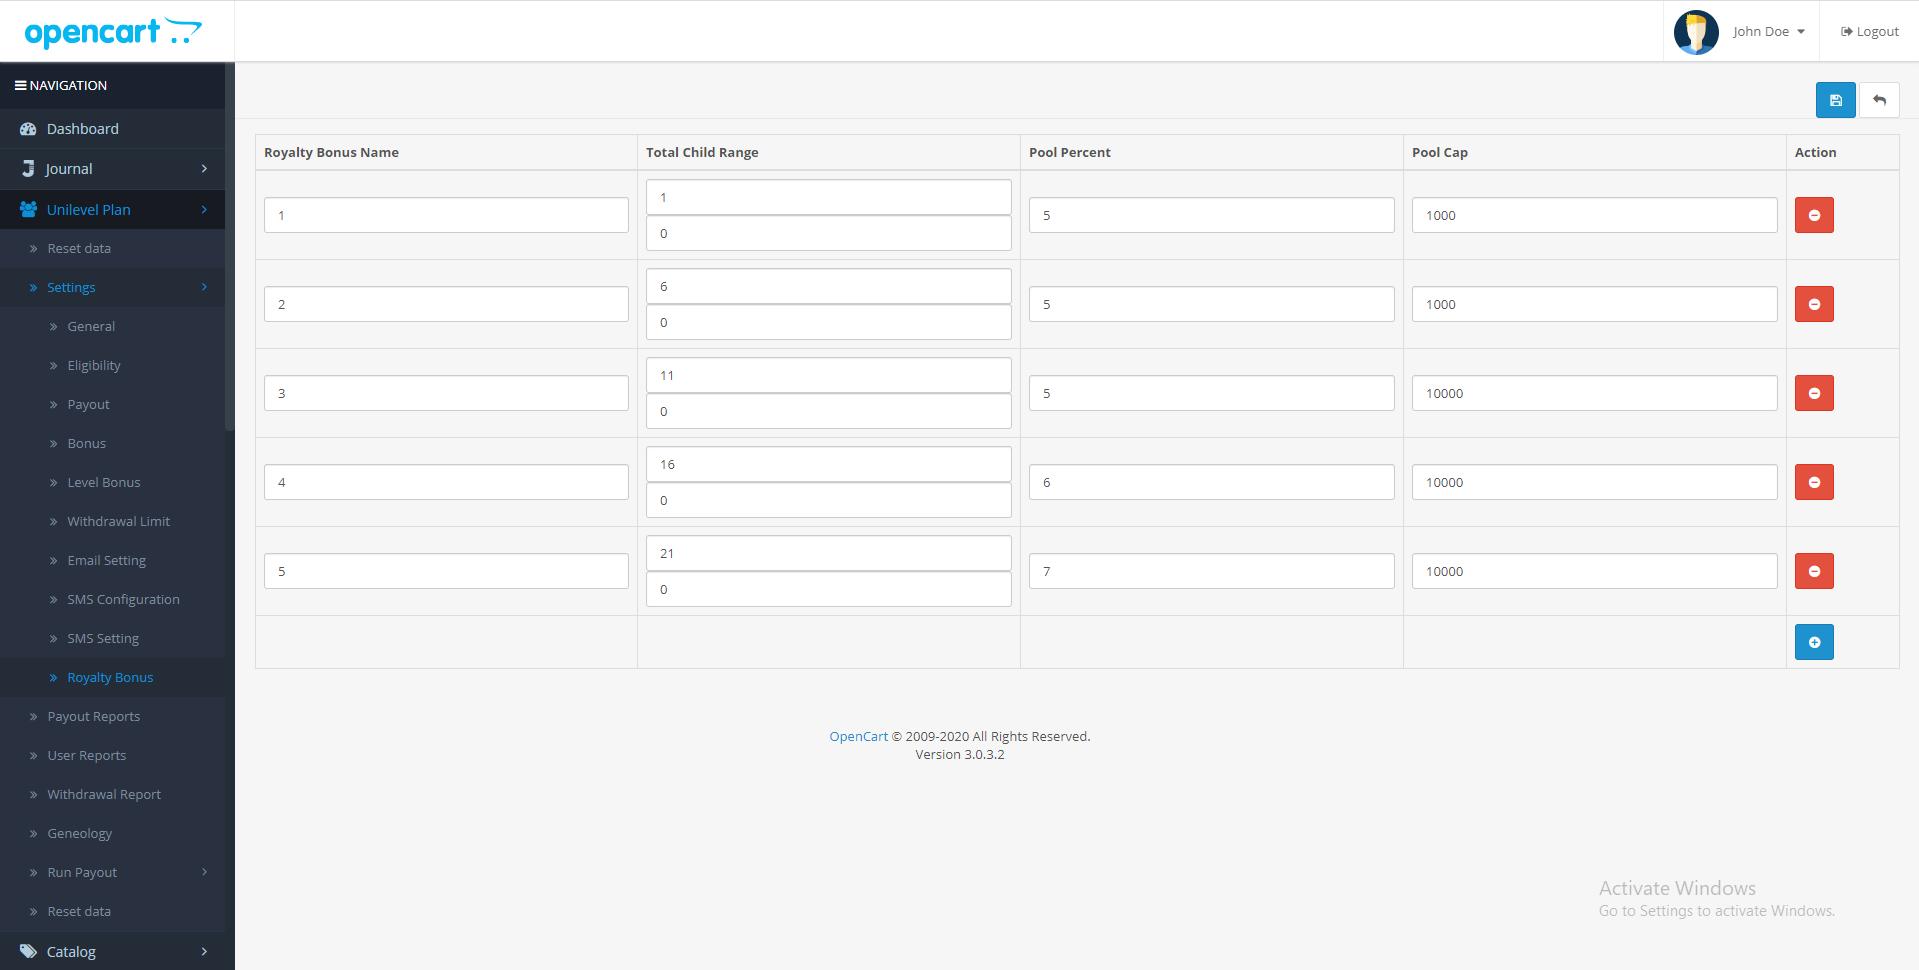 |'Opencart'| |'letscms'| |'opencart unilevel mlm plan'|  |'royality'| |'Dashboard'| |'unilevel mlm plan'| |'mlm'| |'mlm Plan'|  |'setting'| |'new users'| |'unilevel'| |'unilevel mlm extension'| |'costomer list'| |'new users'| |'Installer'| |'mlmtrees.com'| |'mlm plan'| |'extension'| |'Opencart mlm plan'|